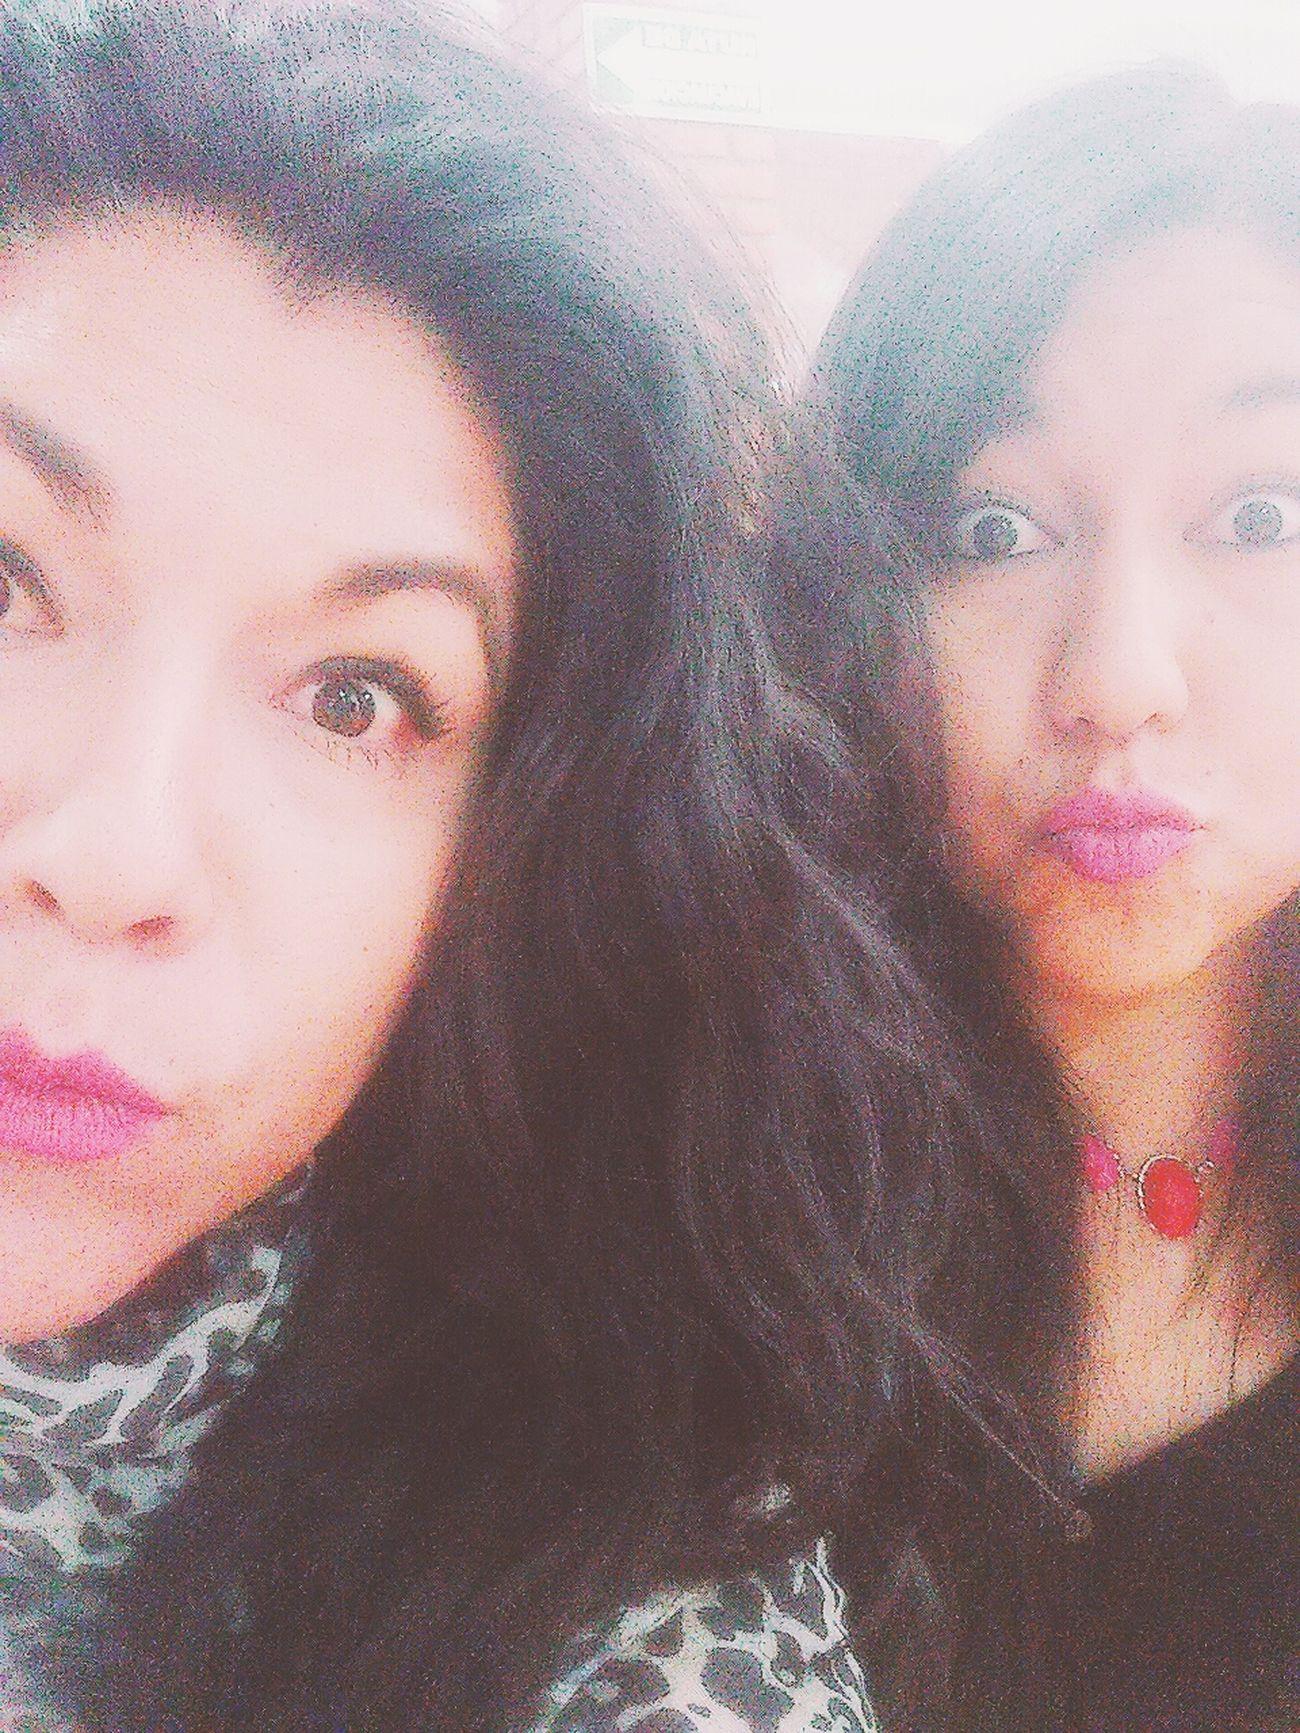 Sisters Hermanas Womanpower Crazygirl Beautiful Woman ❤️ 🙂